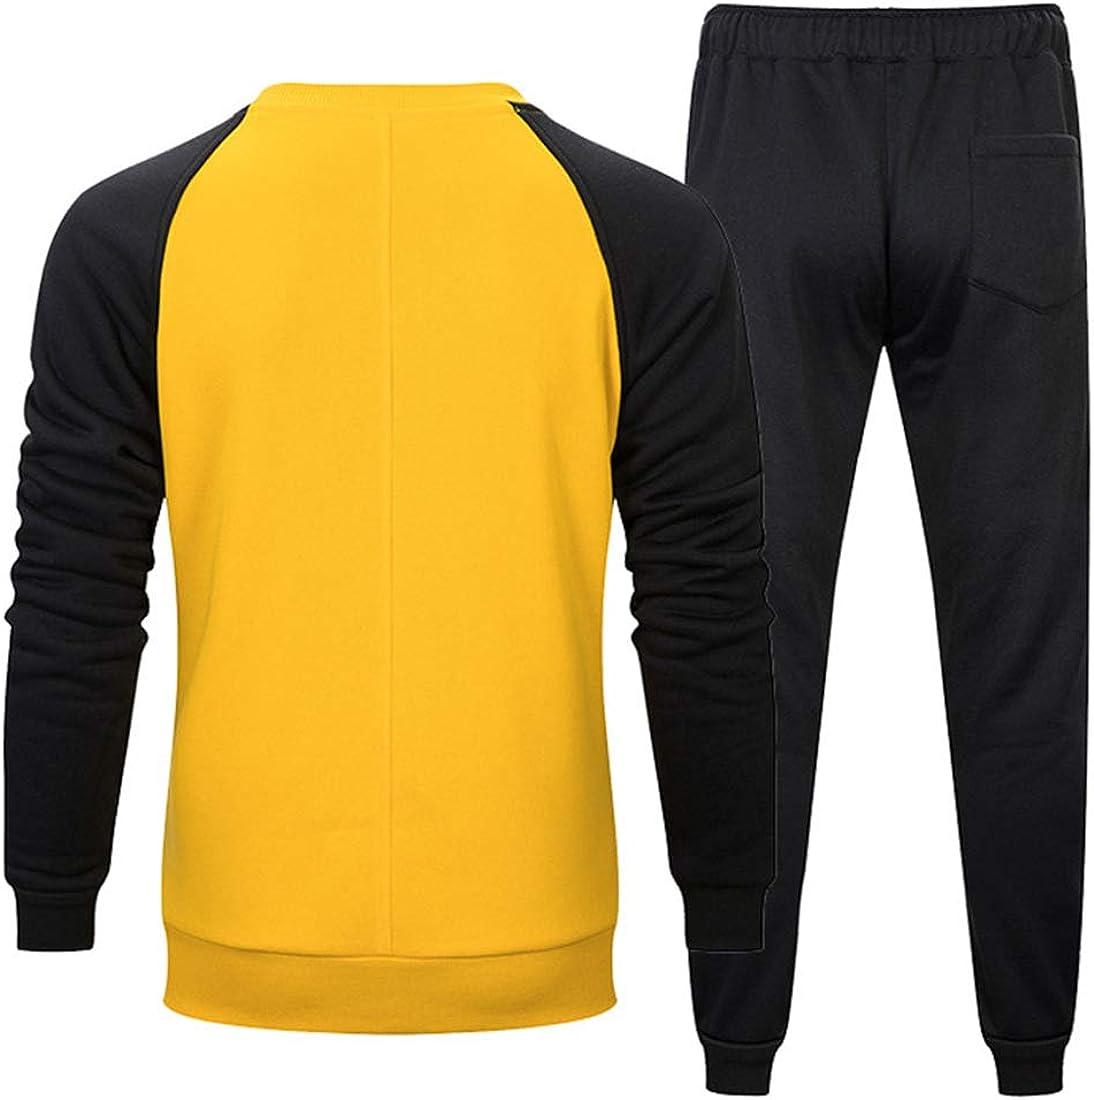 Yczx Tracksuit Mens Set Casual Raglan Sweatshirt Hoodies Top Jogging Trouser Bottoms Lounge Wear Sports Suits 2PCS Full Tracksuit Set Mens Hoodie Tops Bottom Trouser Fashion